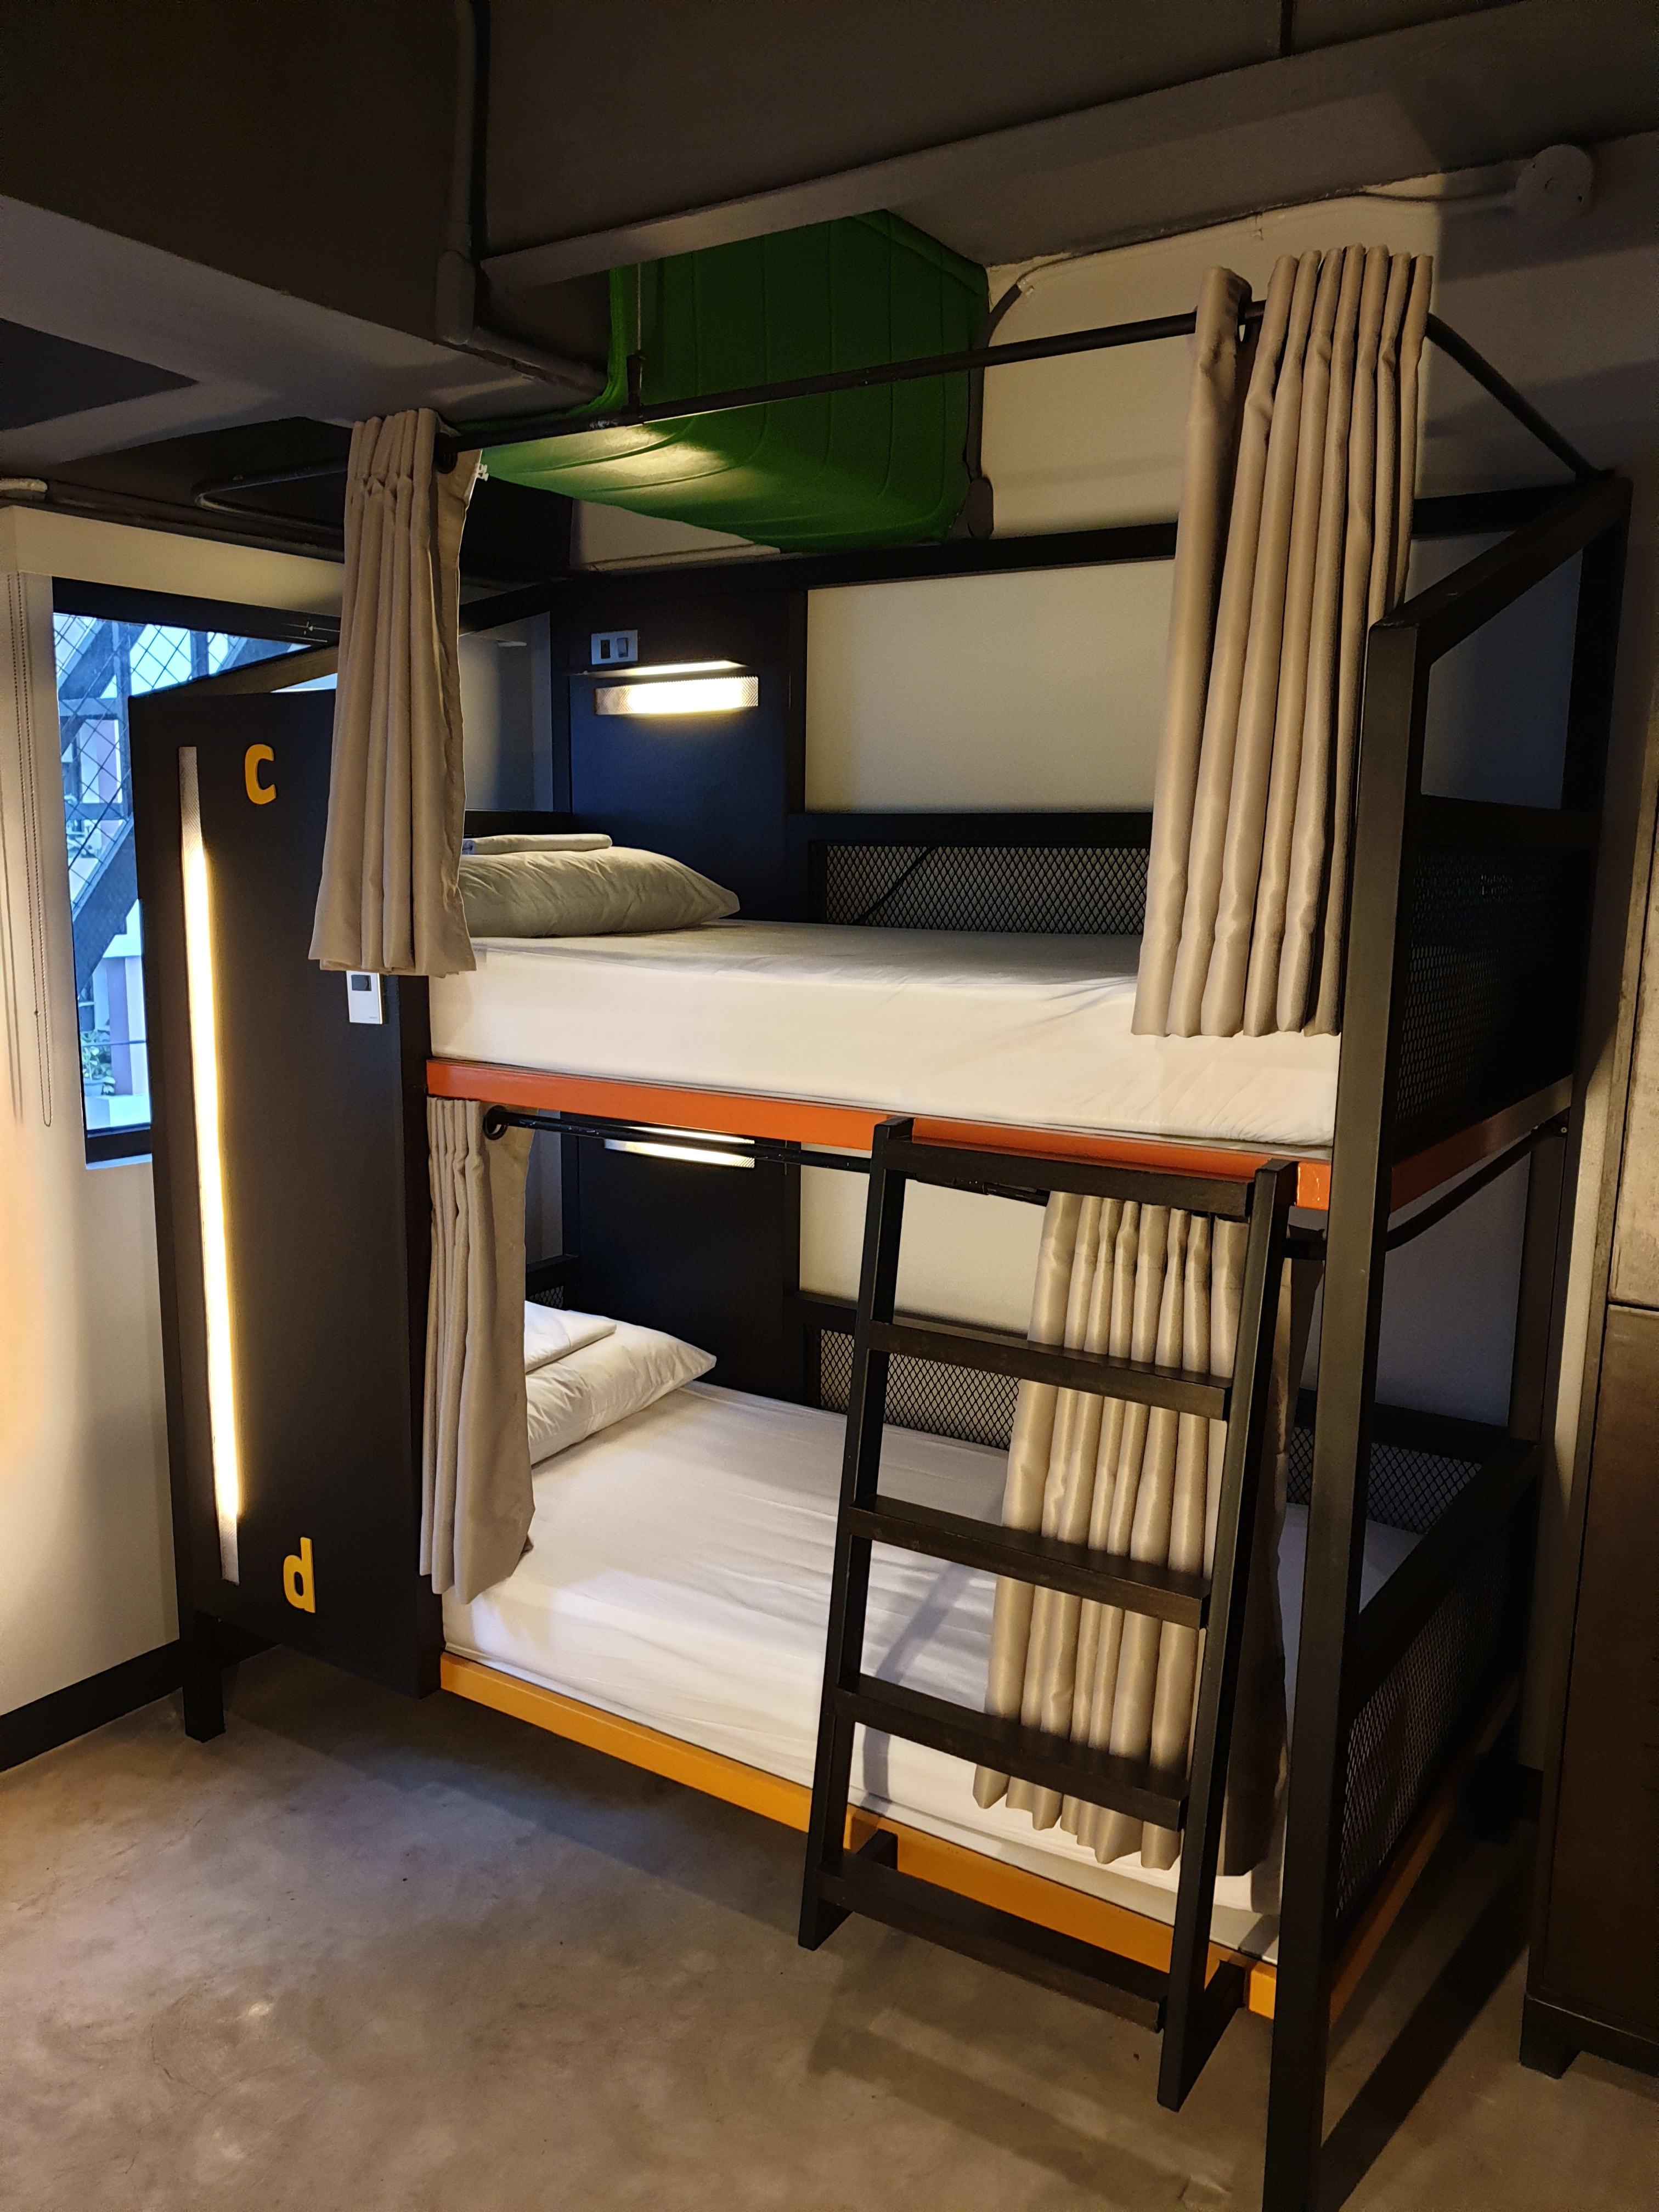 HOSTEL - Bunk 5021 Hostel